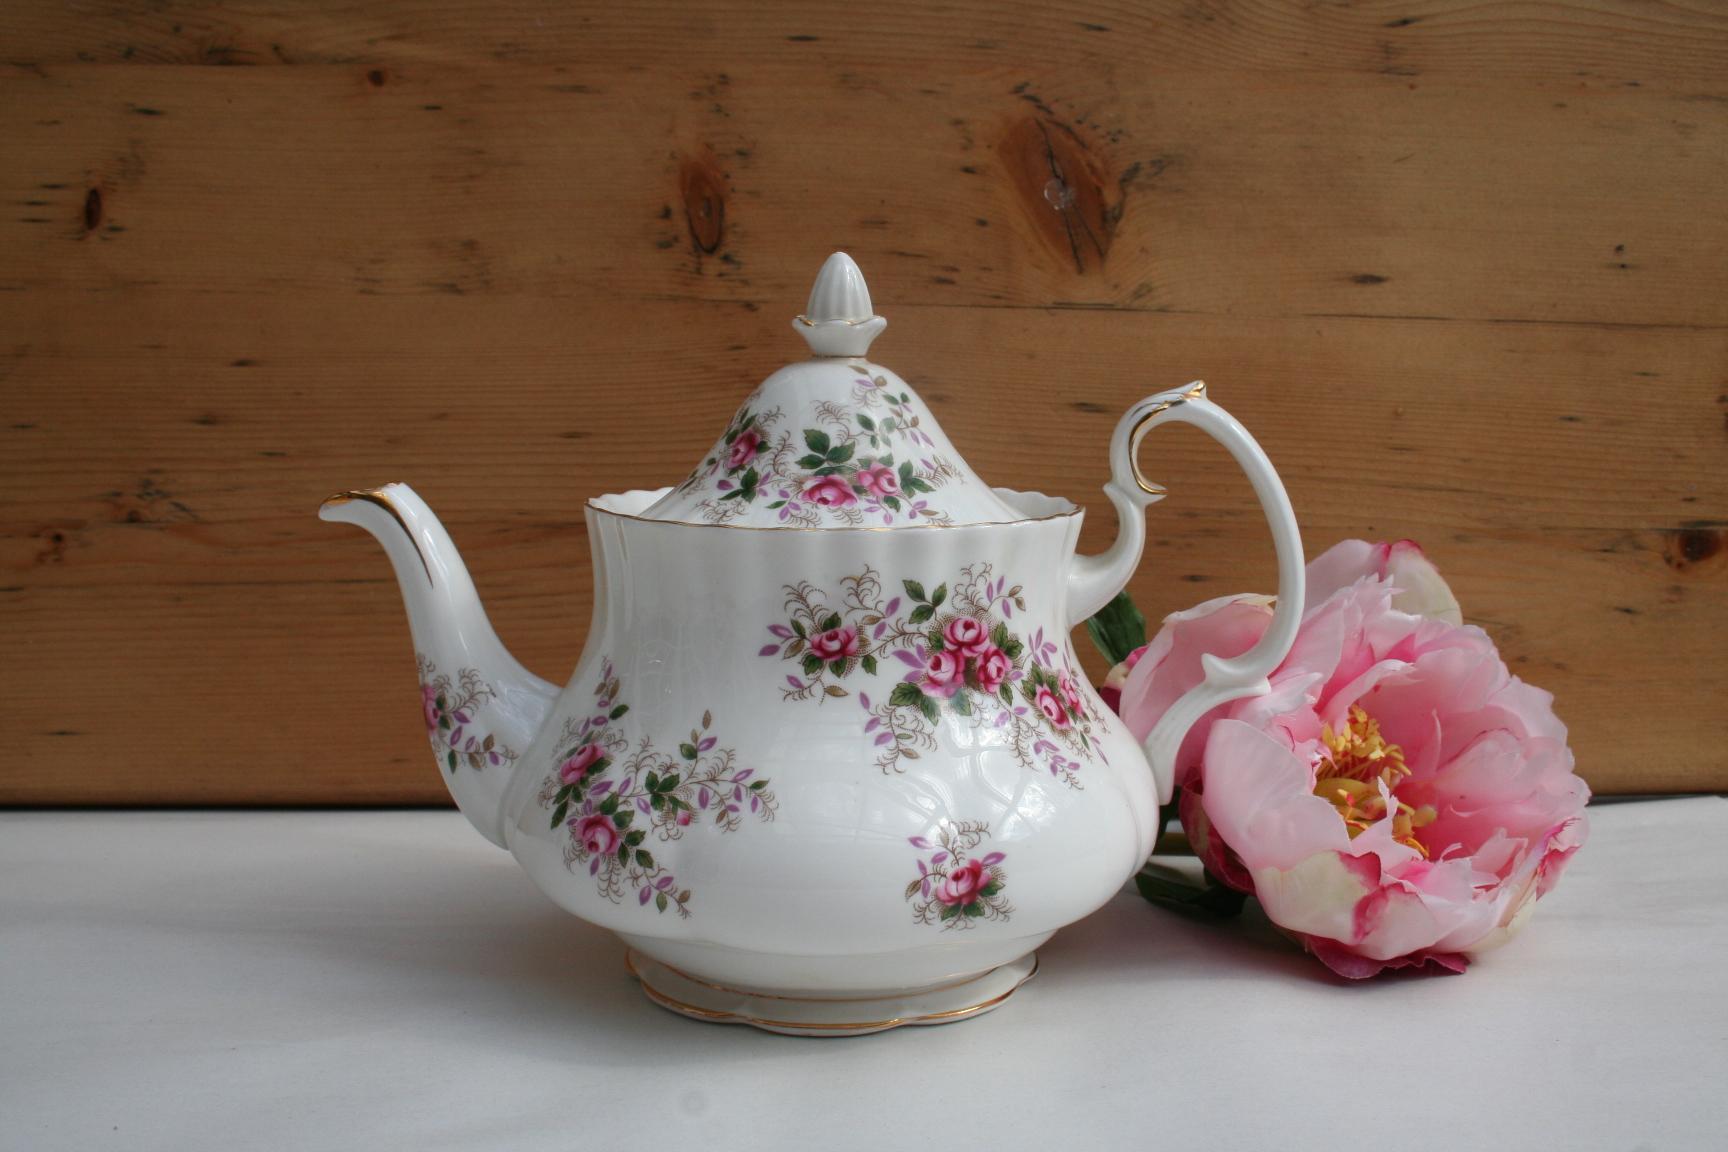 Royal Albert Servies Lavender Rose.Theepot Royal Albert Decor Lavender Rose Het Derde Servies